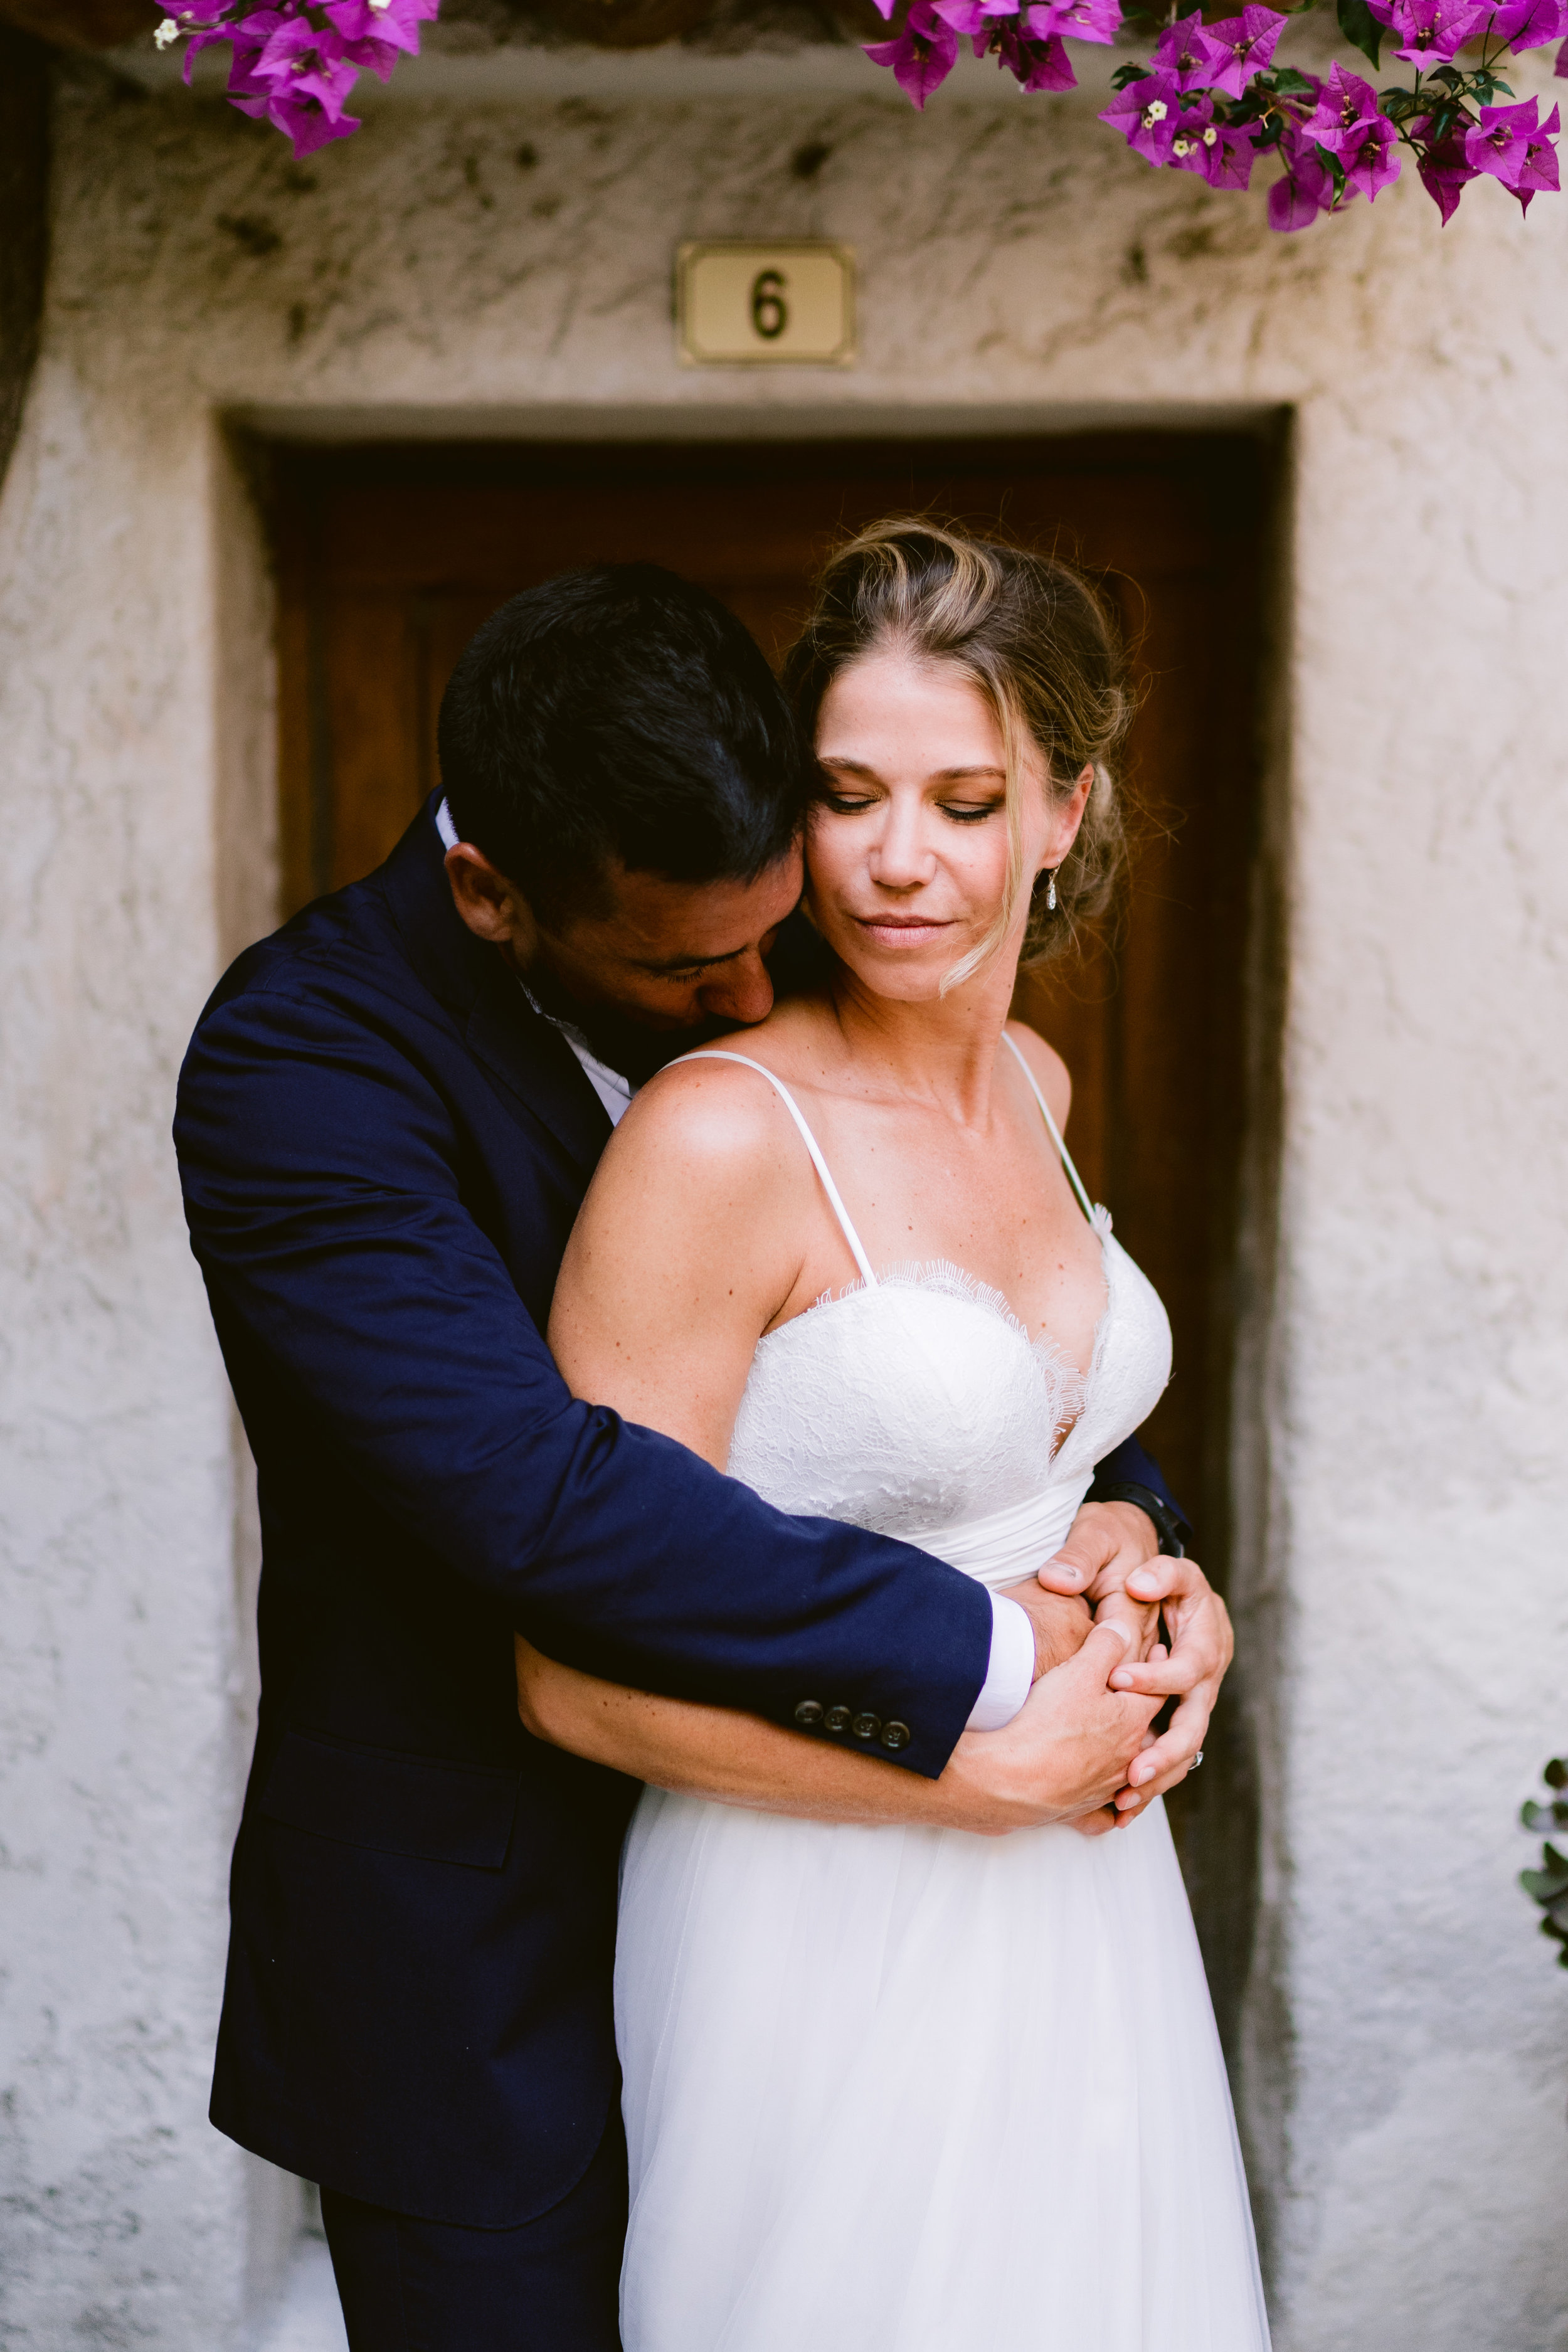 english photographer in france, wedding photographer saint tropez, romantic wedding photography france, chateau wedding france, cote d'azur wedding photographer, ramatuelle wedding (20).jpg